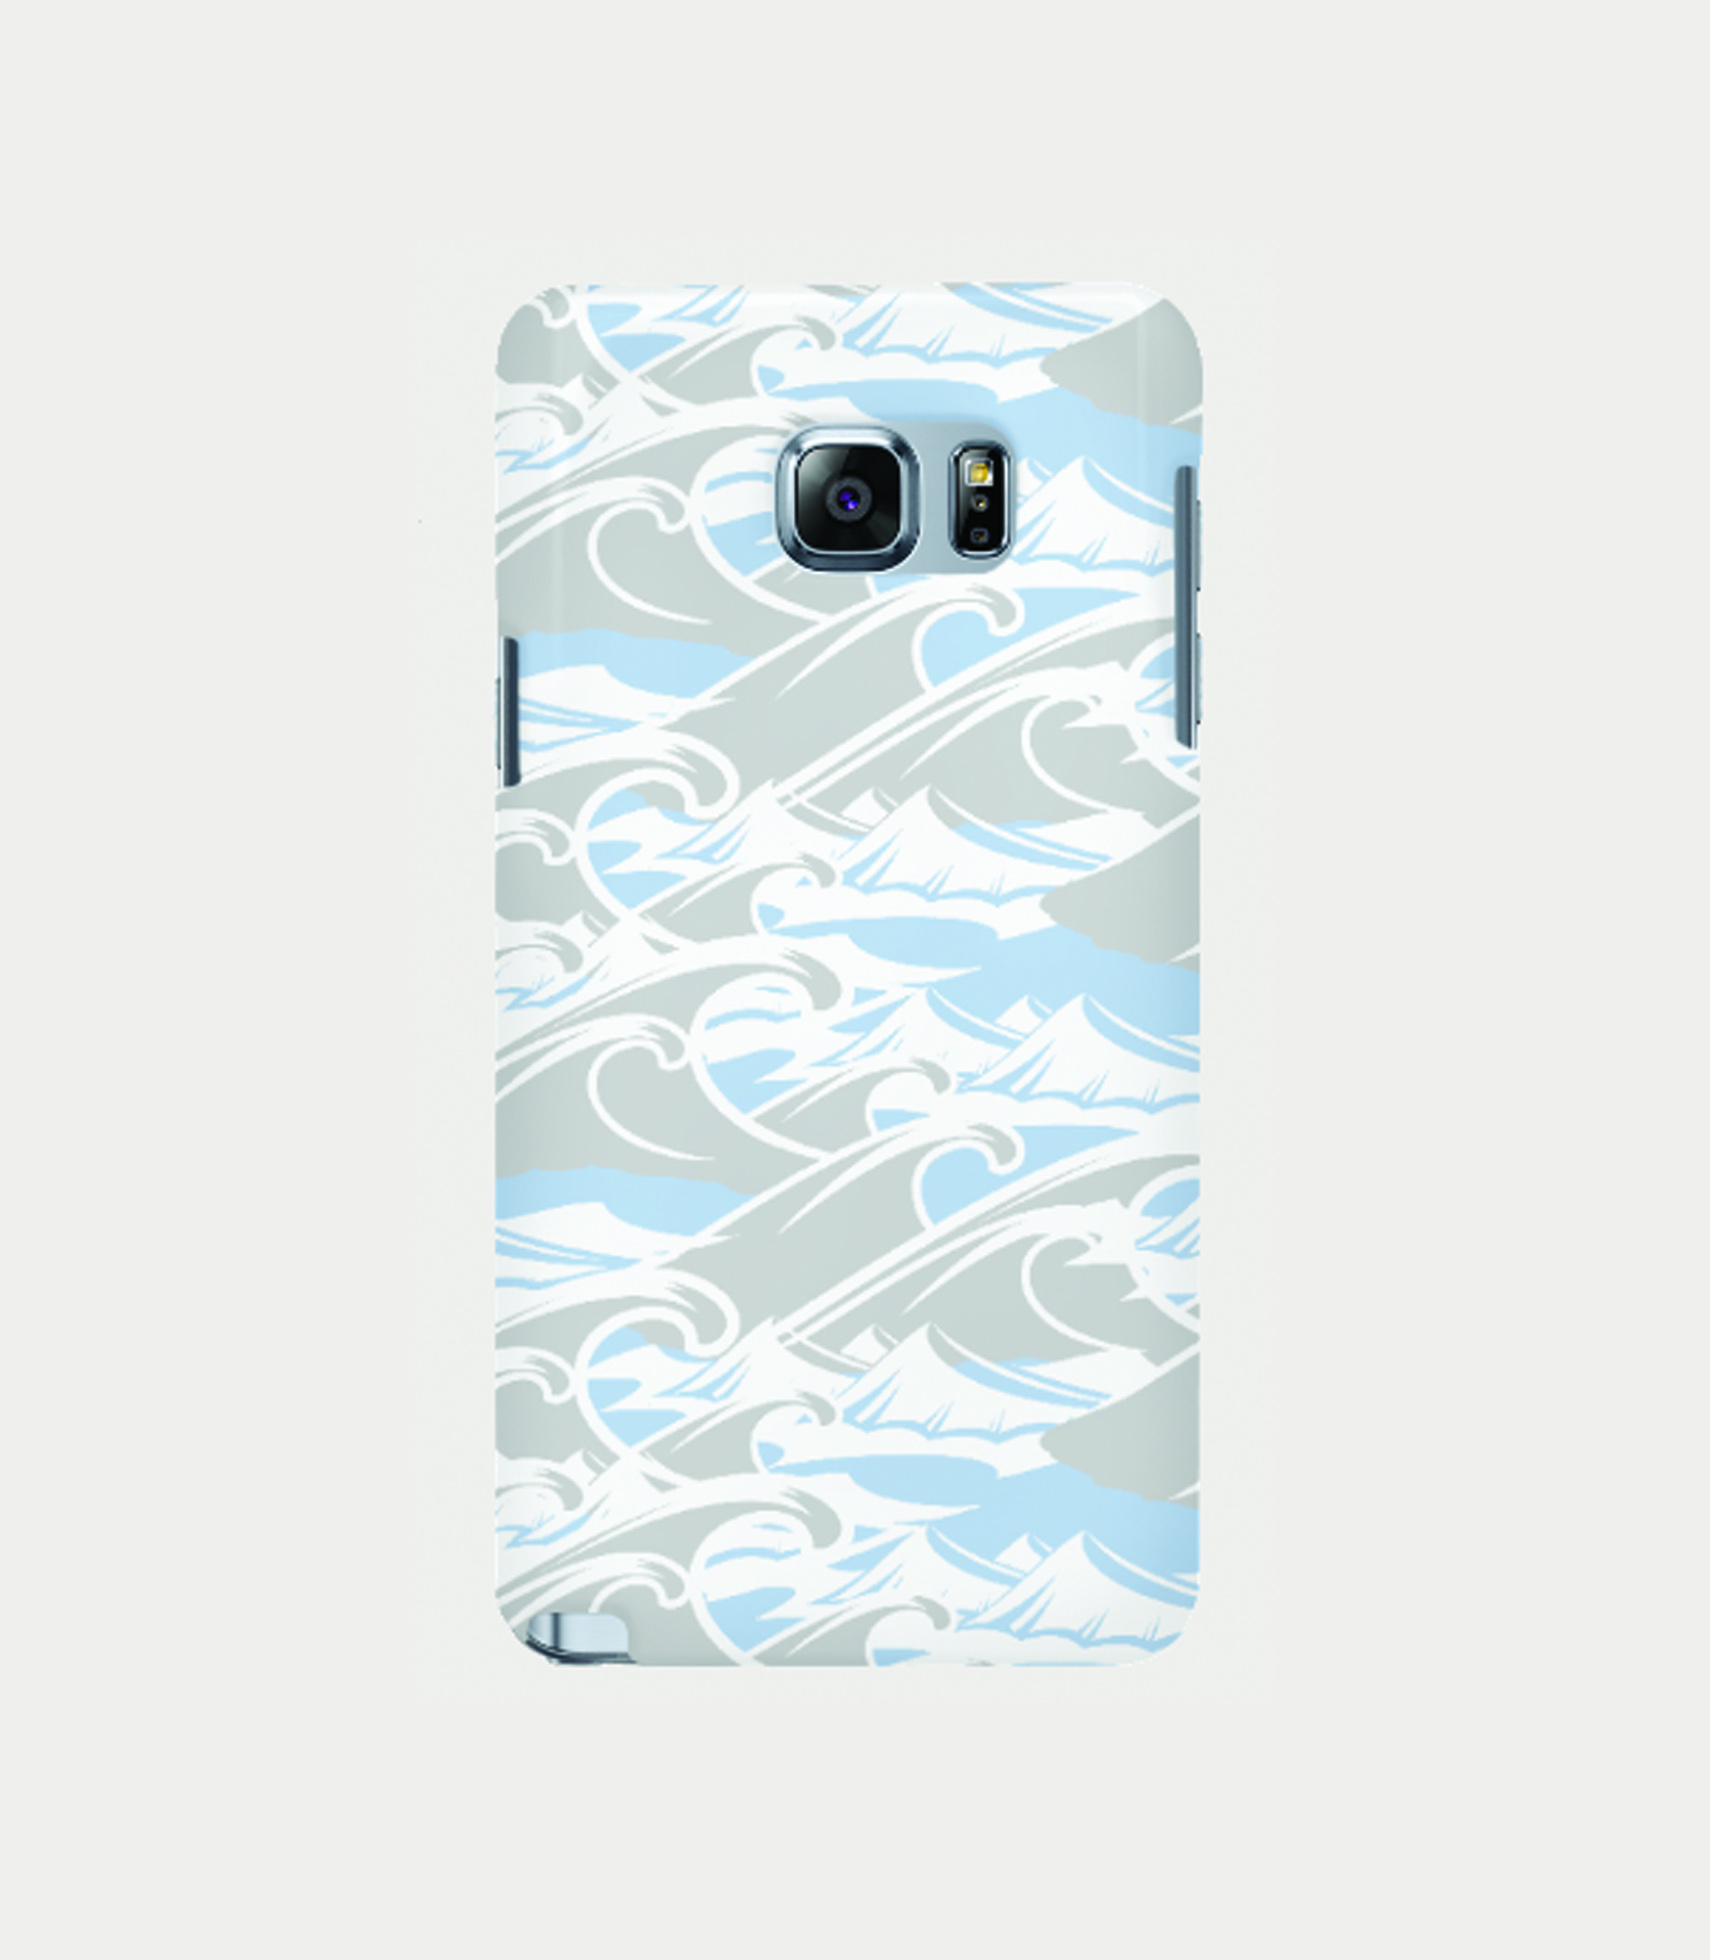 theKreativelab_Waves_Samsung.jpg